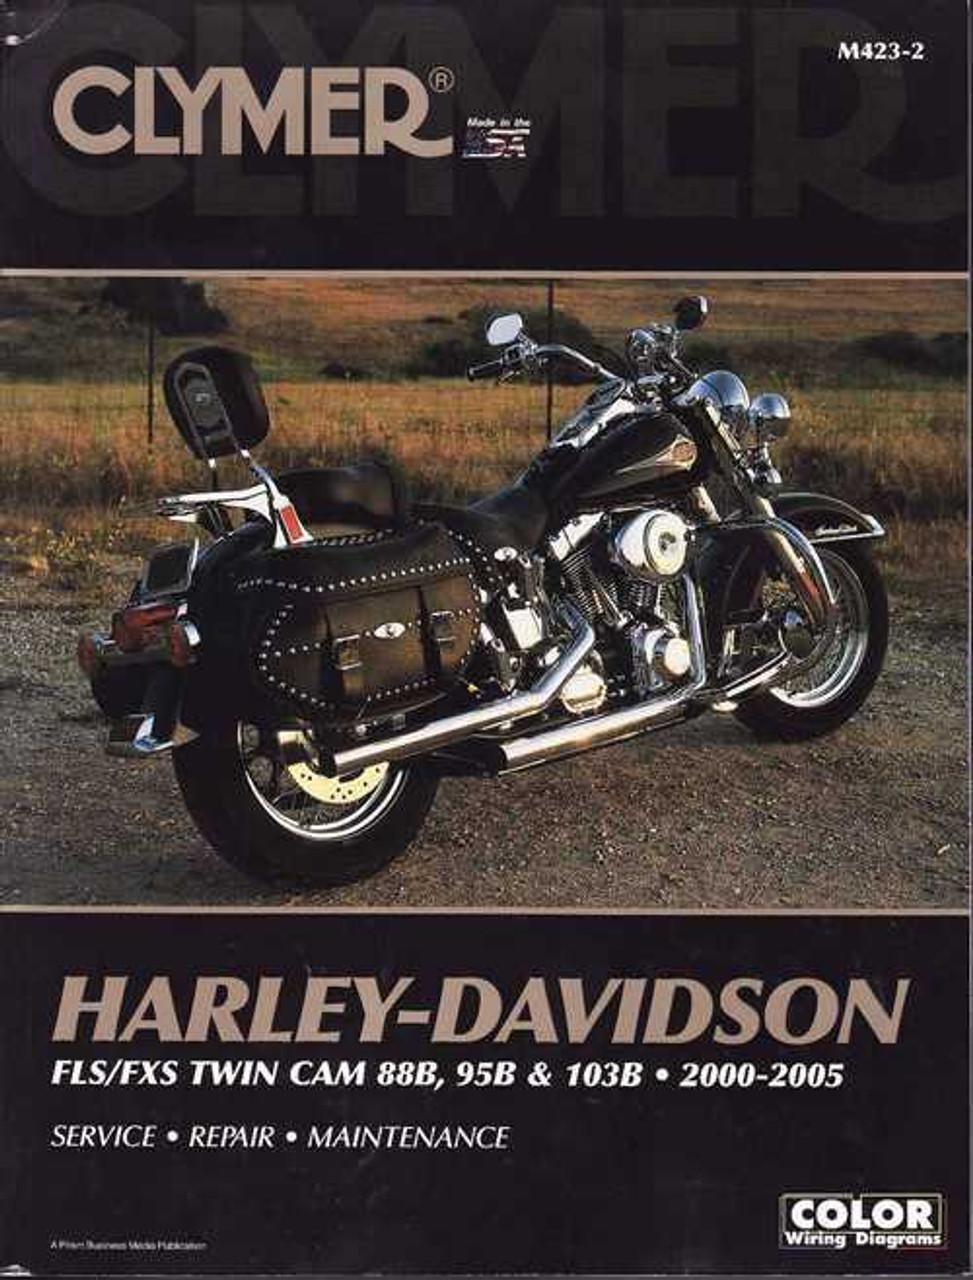 Harley-Davidson FLS/FXS TWIN CAM 88B, 95B and 103B 2000 - 2005 Workshop on